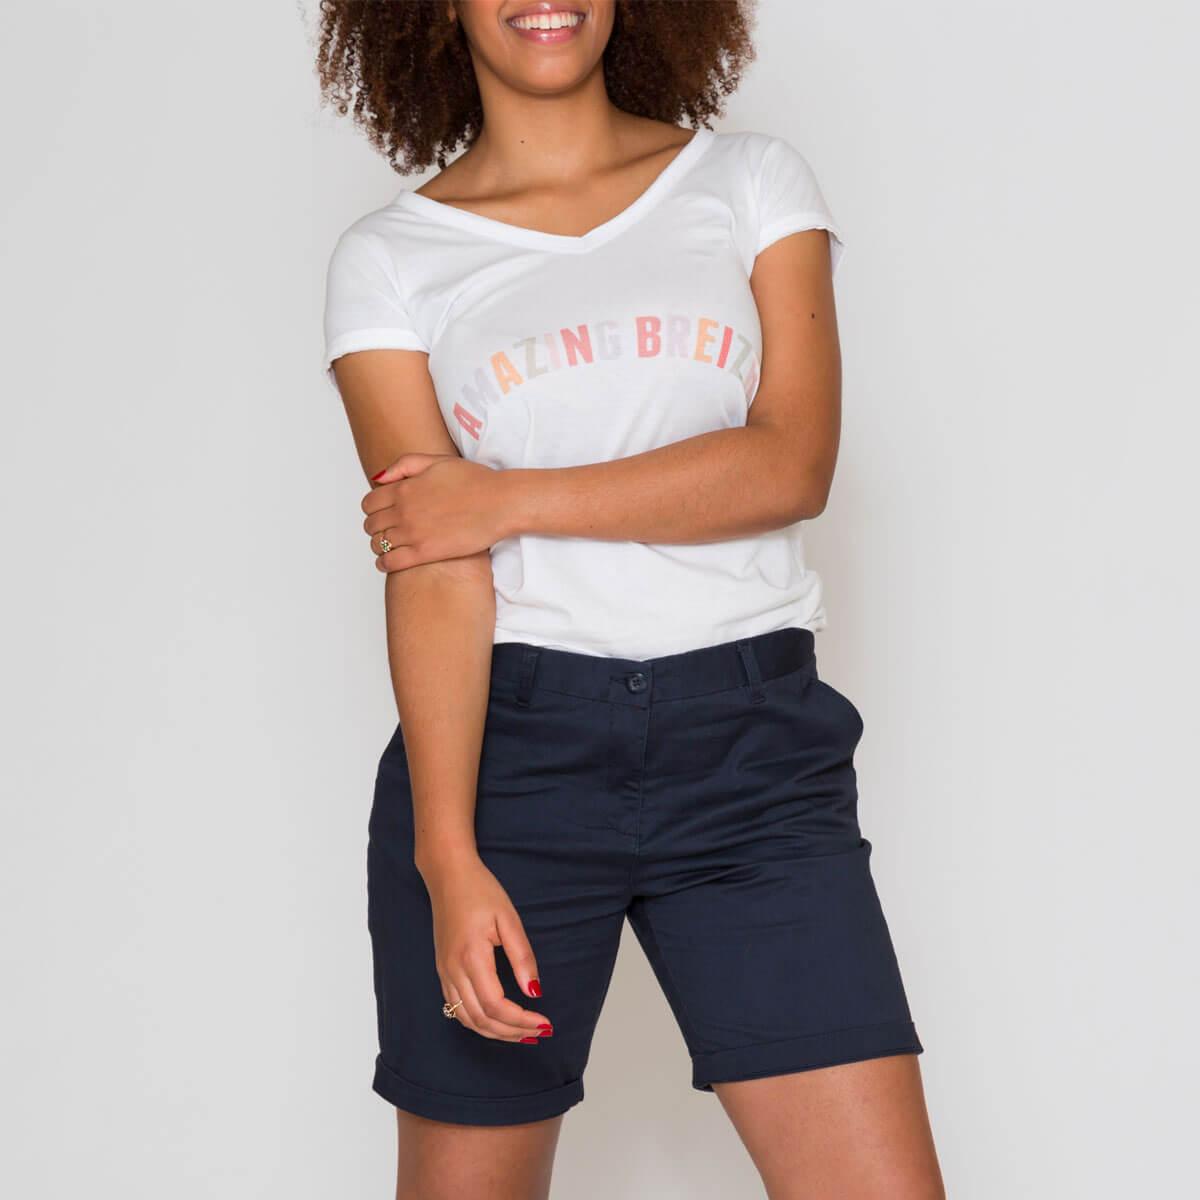 Tee-shirt-blanc-femme-Amazing-Breizh-zoom